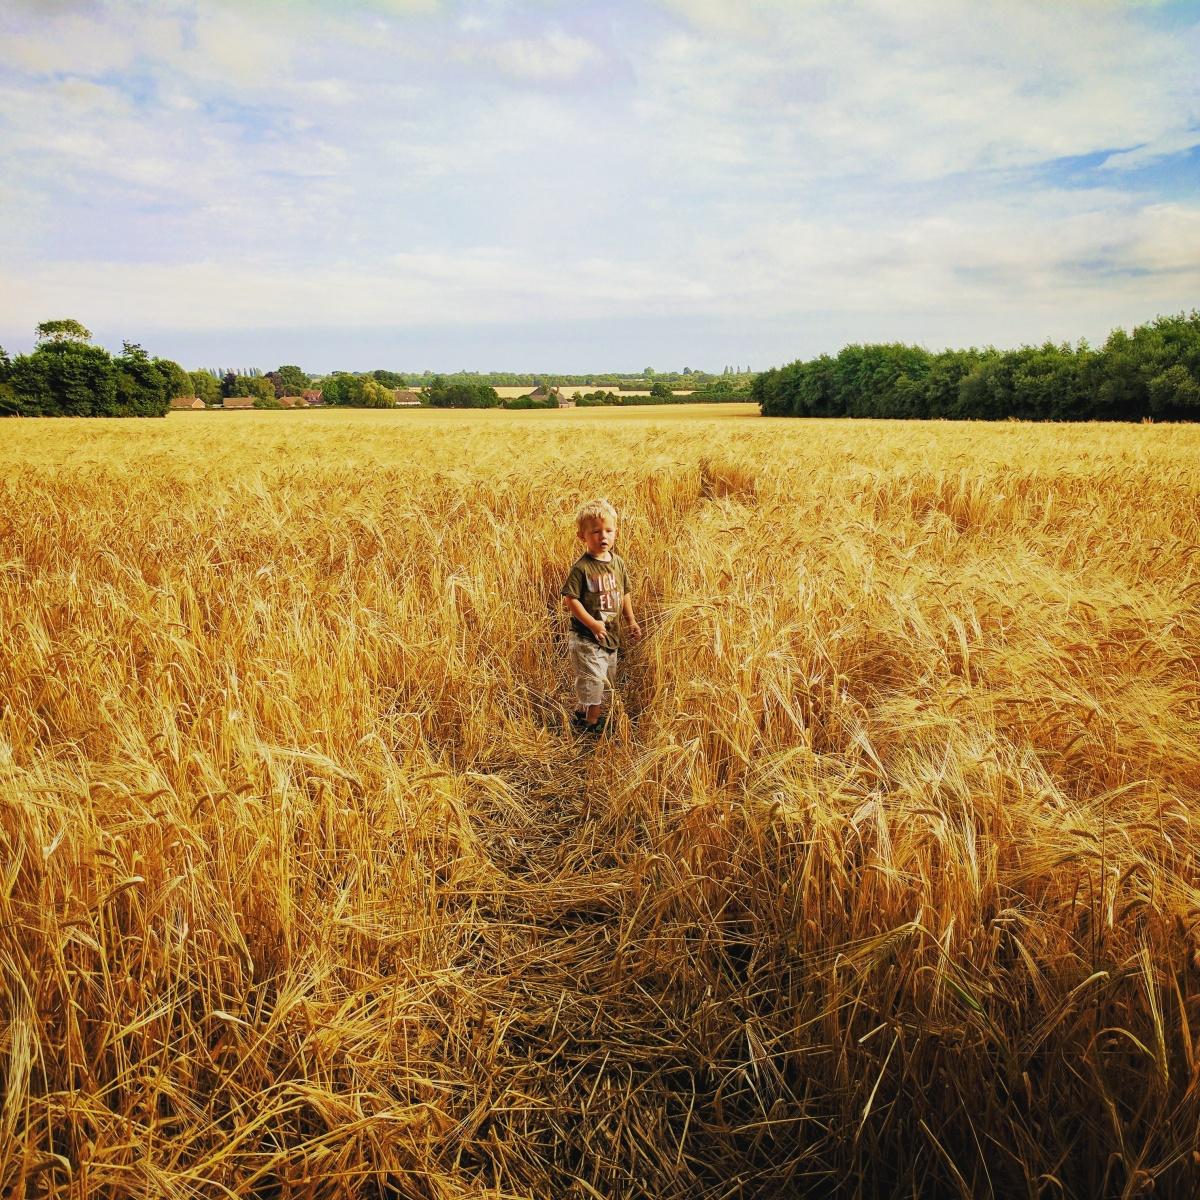 Freddie exploring the 🌽 #havant#littleexplorer